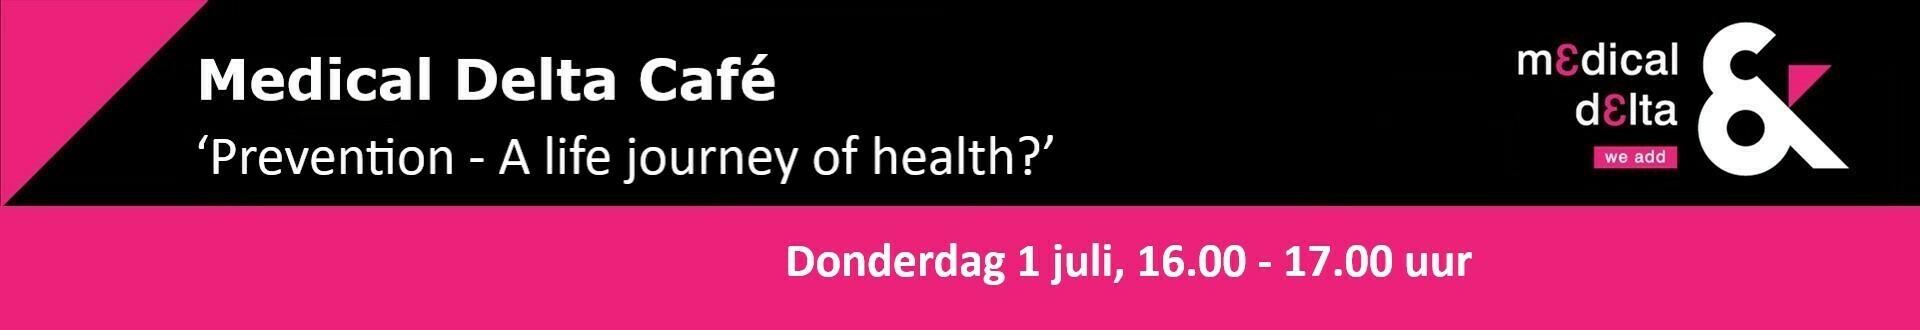 Medical Delta Café donderdag 1 juli 2021